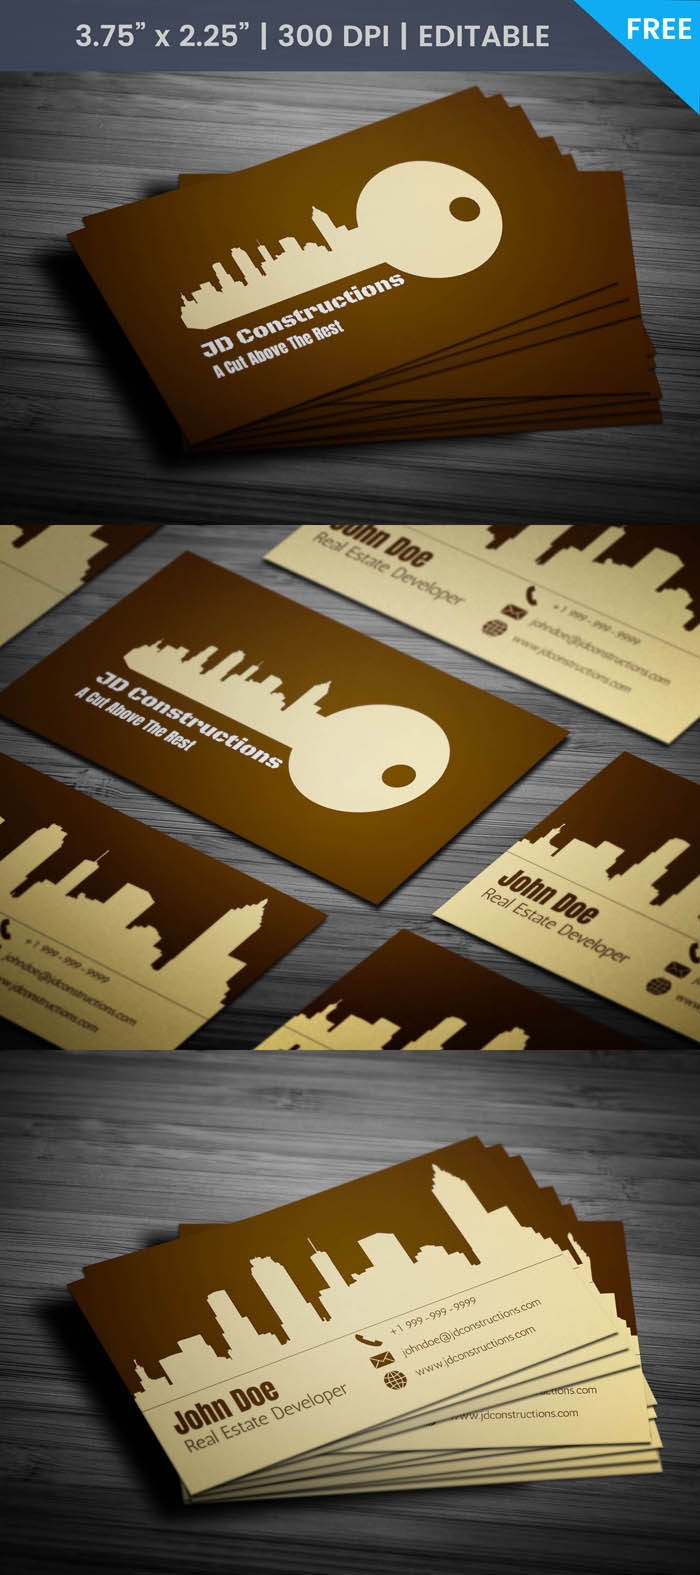 Free Unique Construction Business Card Template